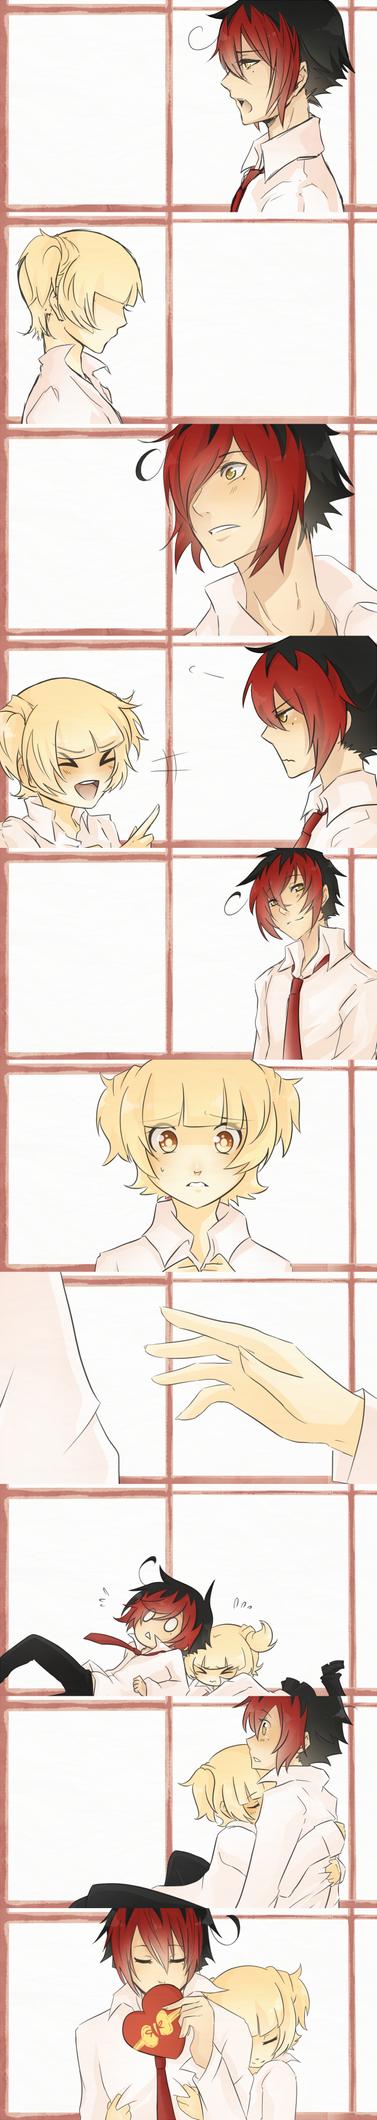 :Confession:Rehersal:KAI:KIM:Hachi:Makune: by KaiSuki